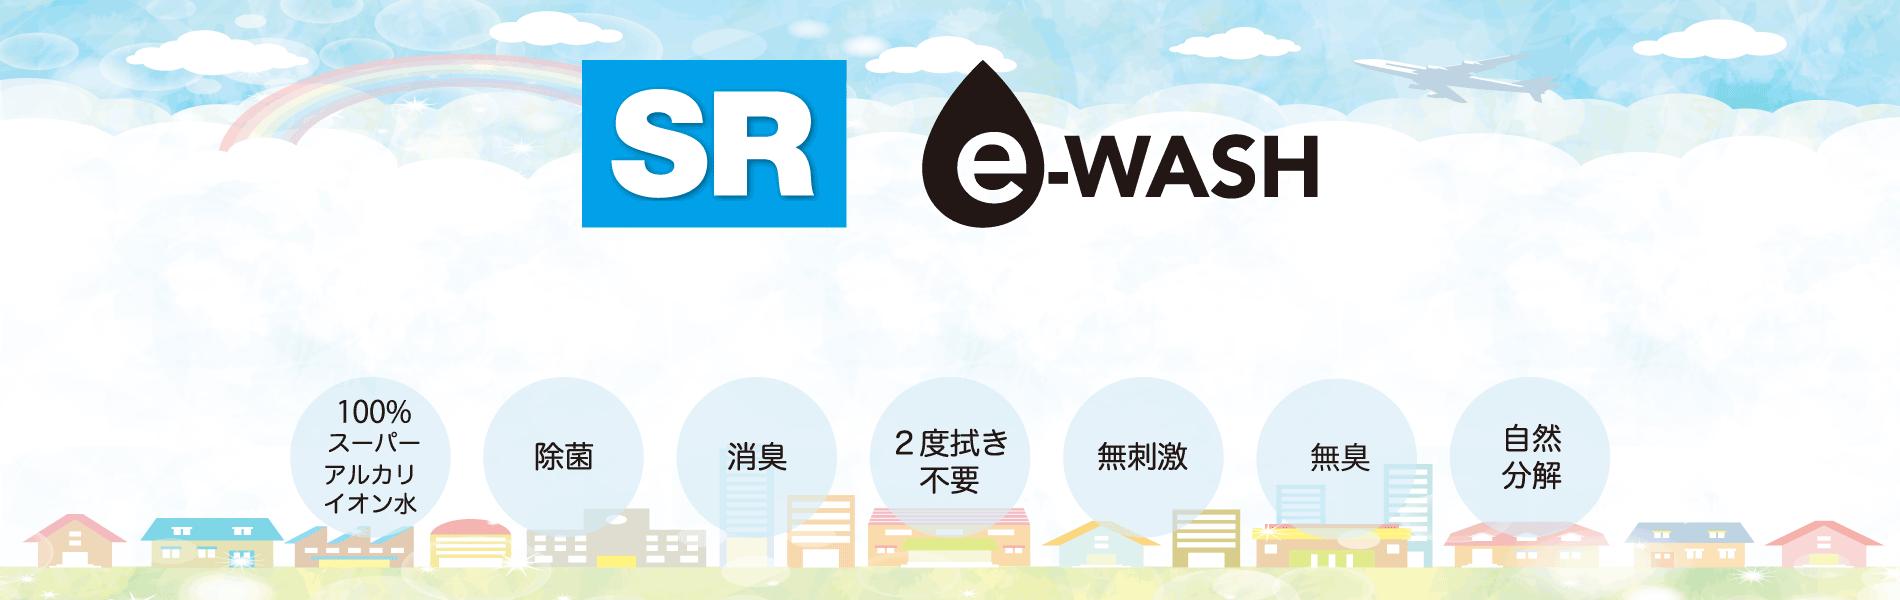 SR x e-WASH イーウォッシュ